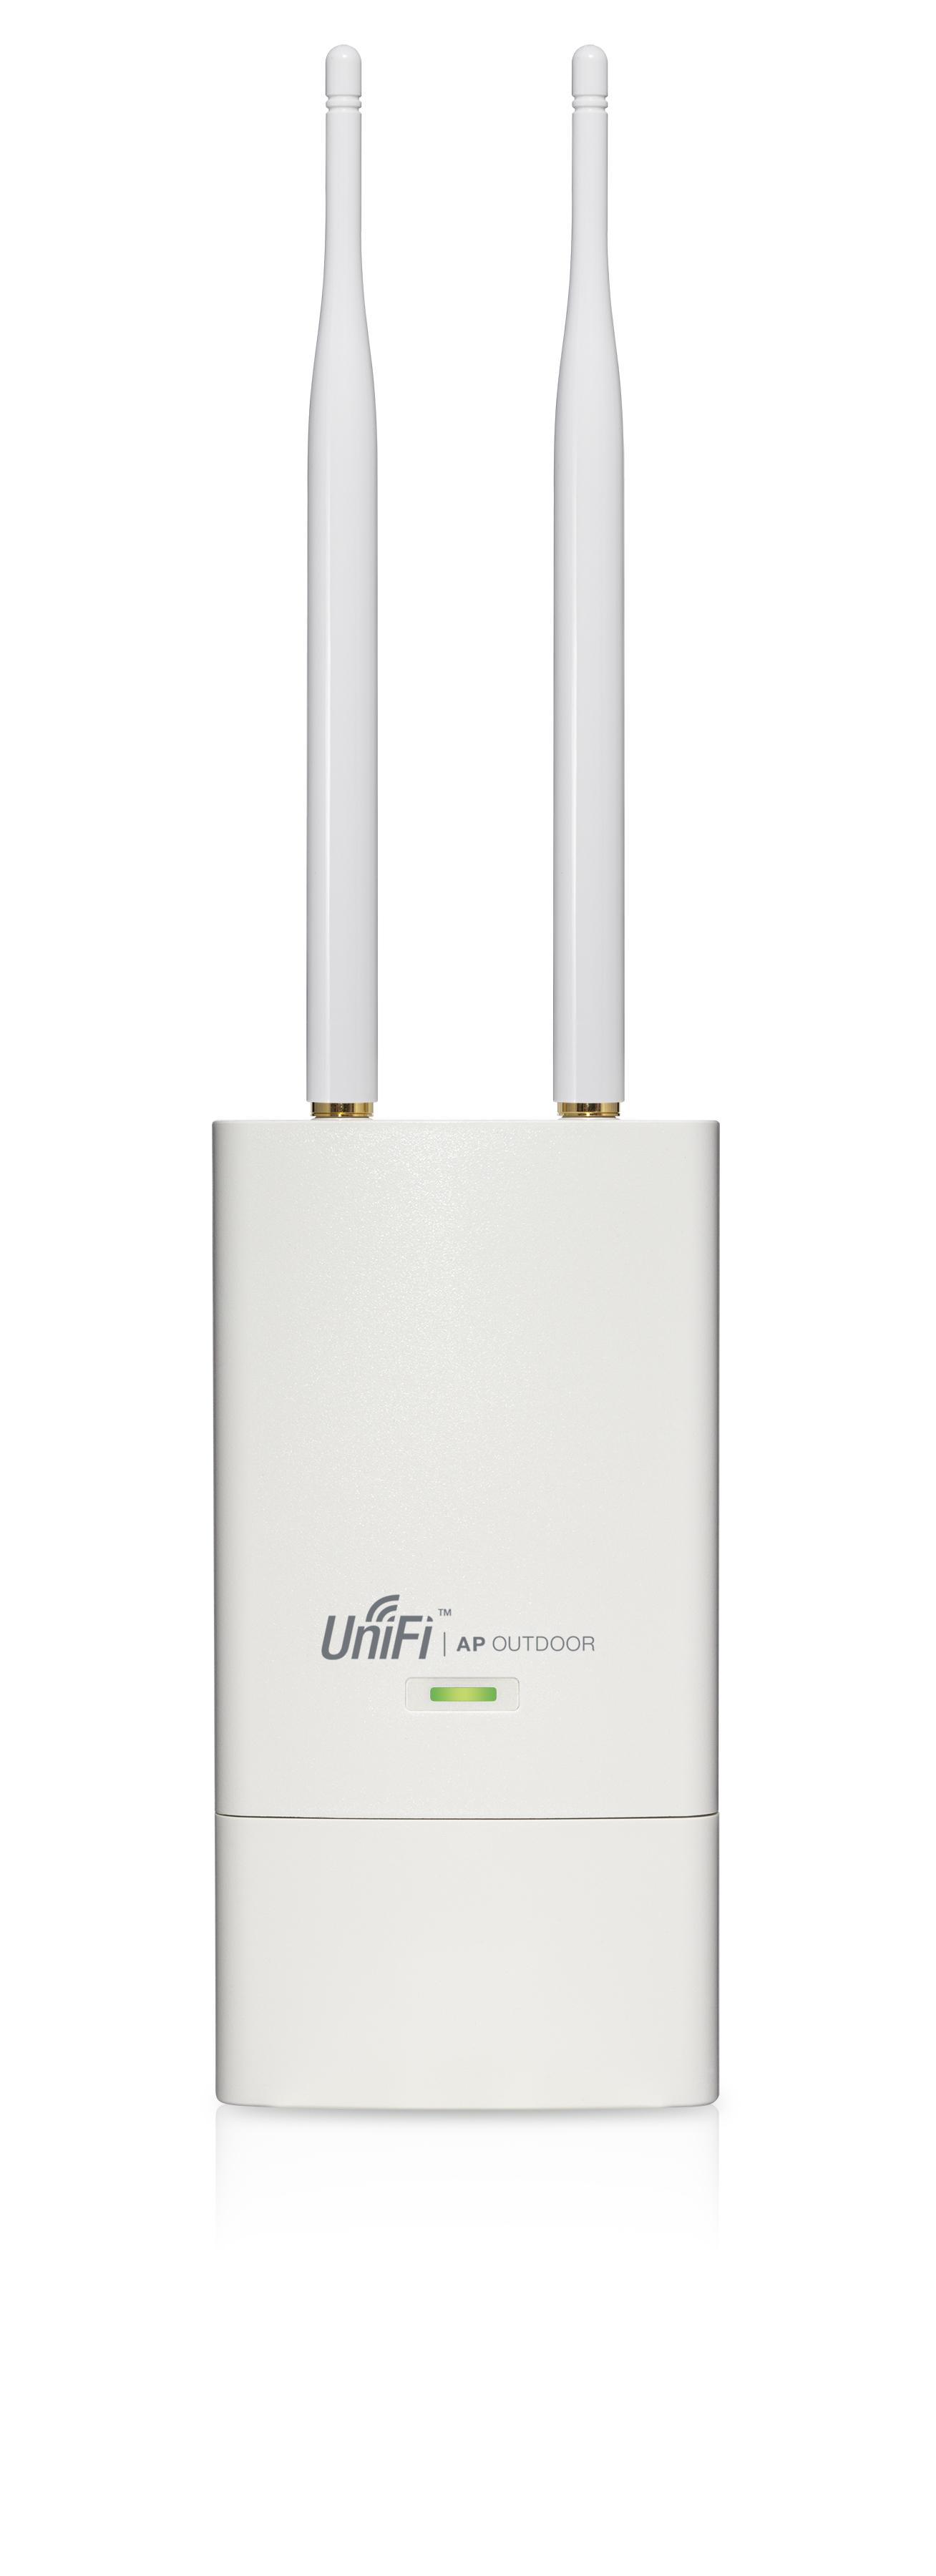 Unifi Ap Outdoor 5g Ubiquiti Lisconet